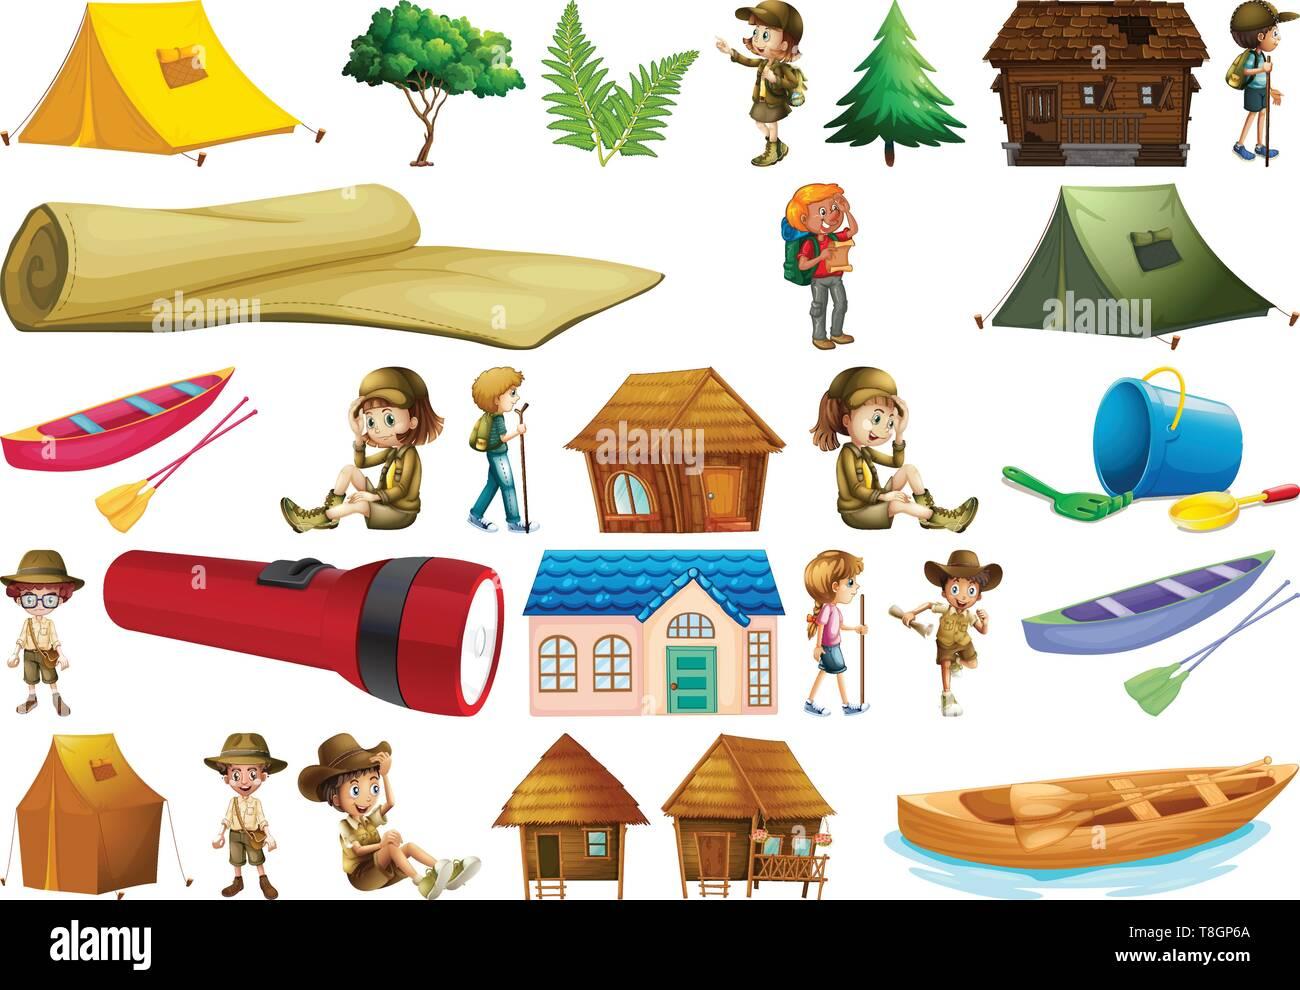 Set of camping element illustration - Stock Image